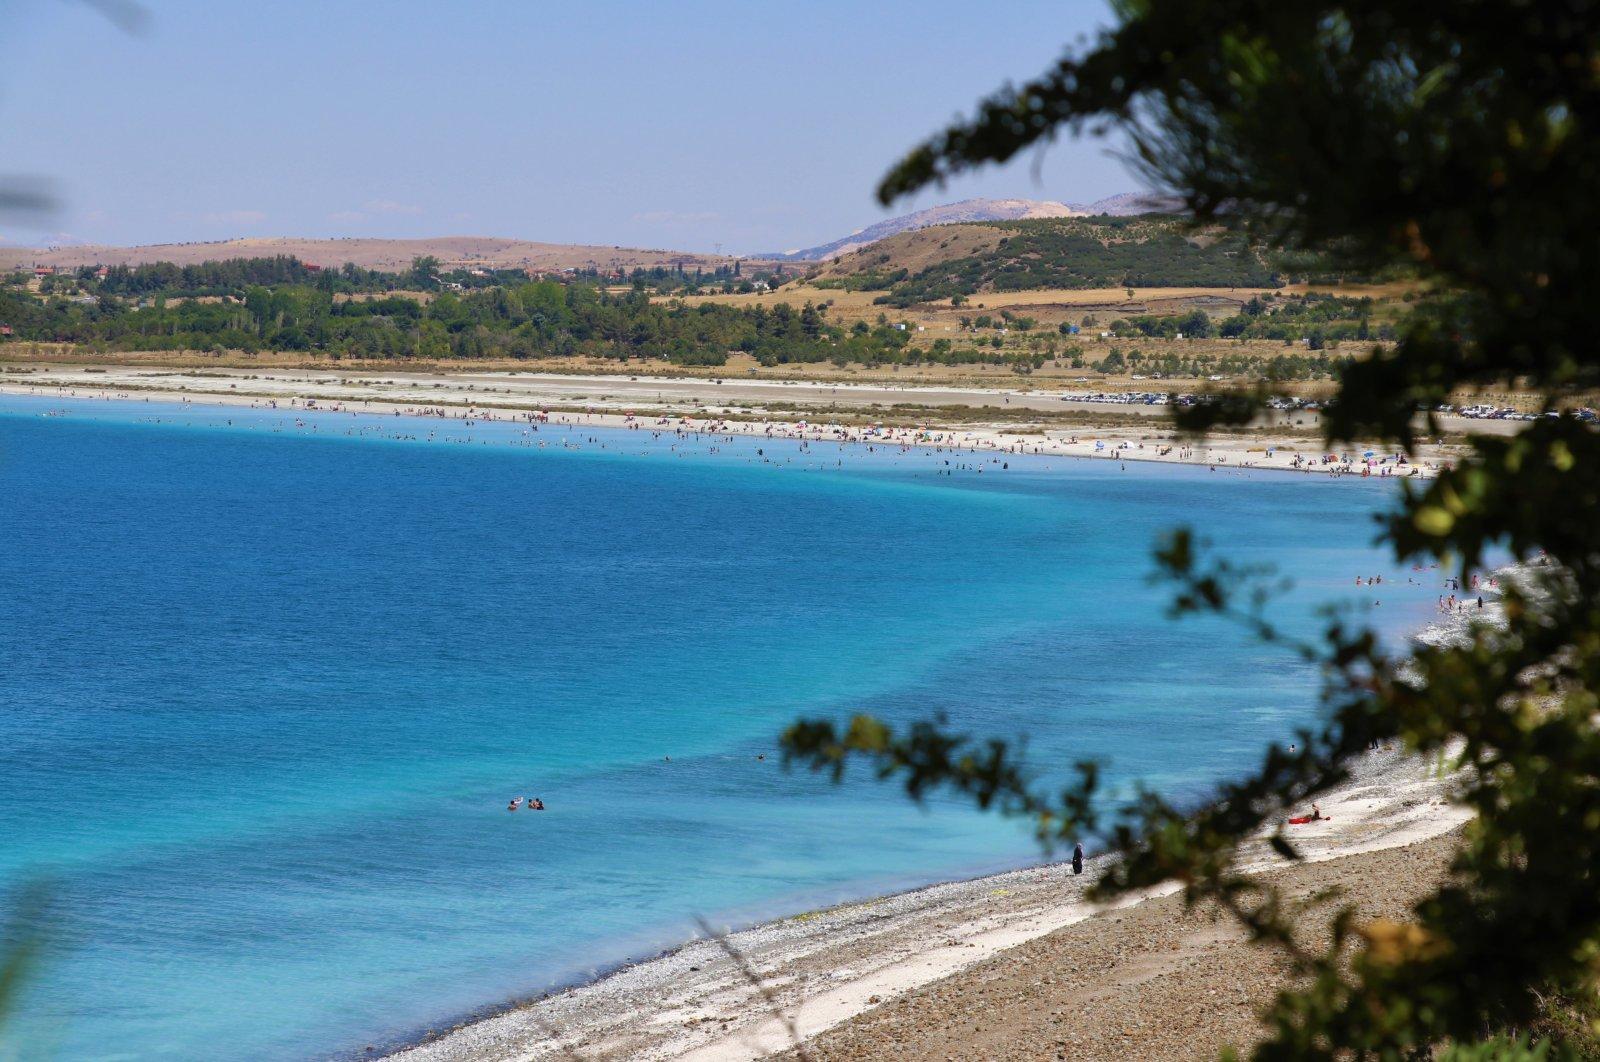 A view of Lake Salda, in Burdur, southwestern Turkey, Aug. 10, 2020. (AA Photo)